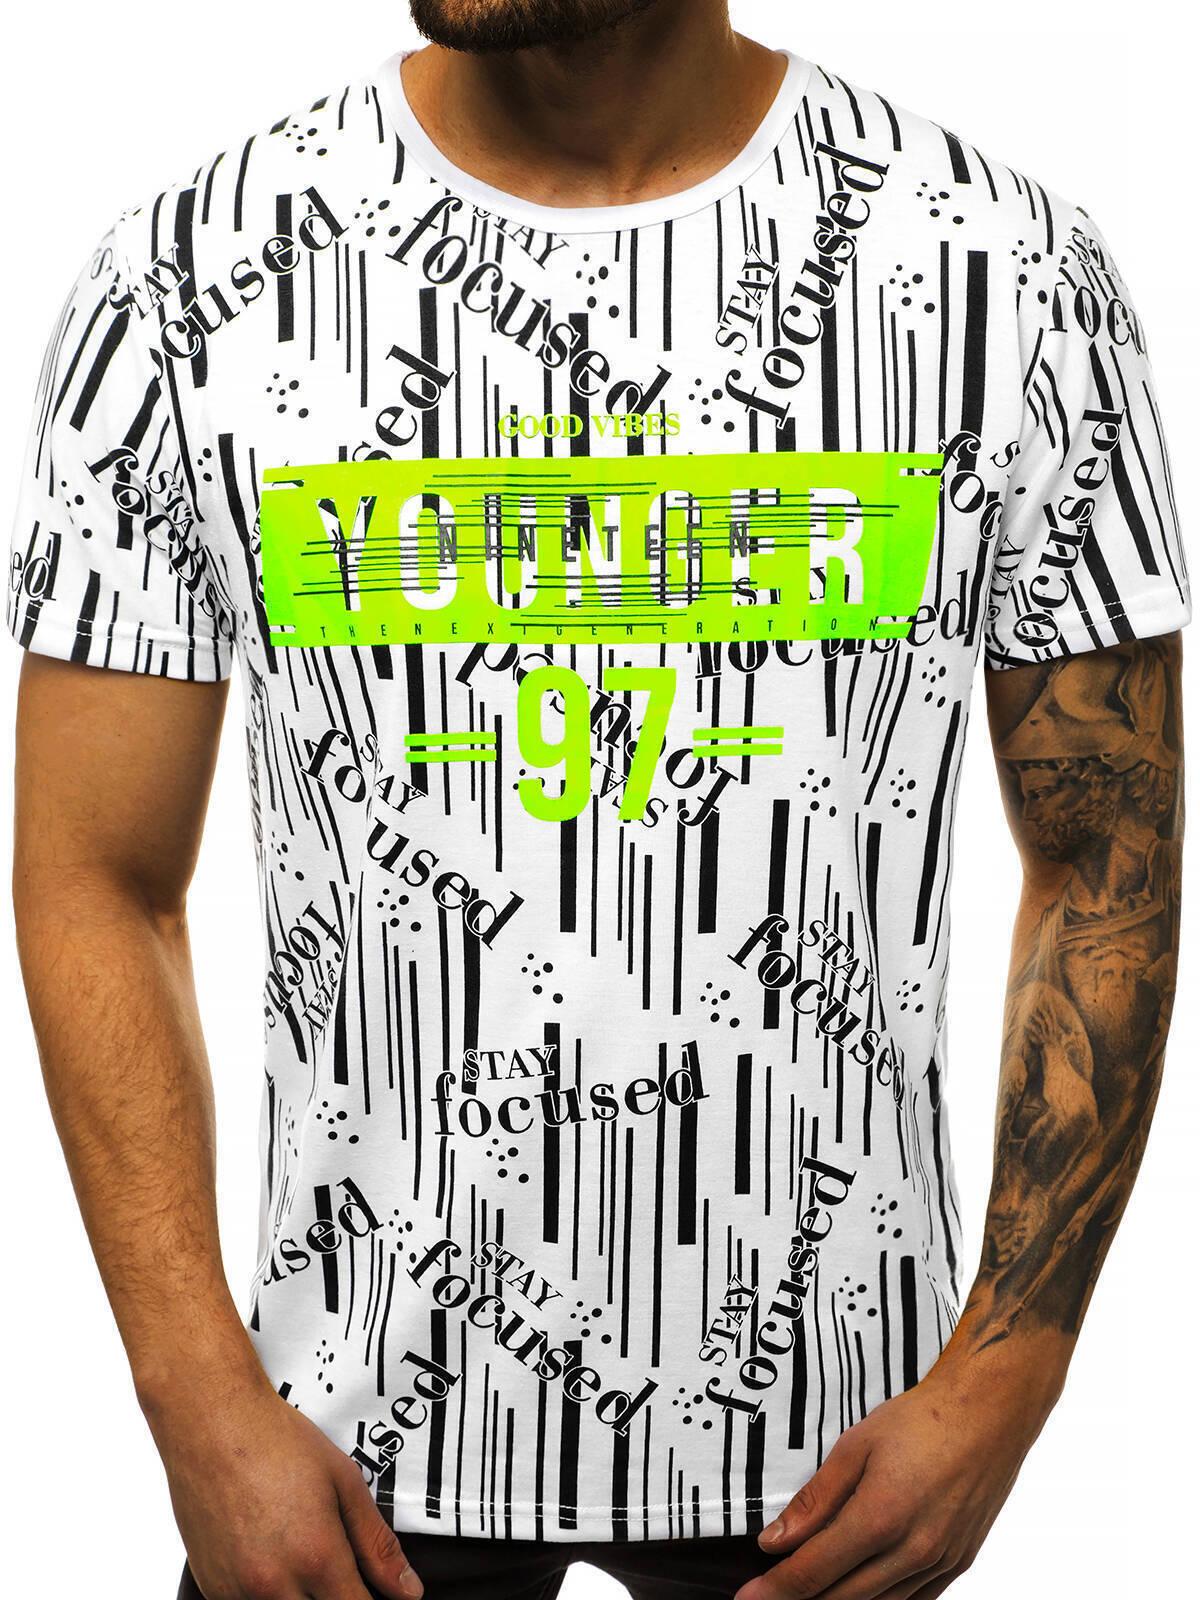 Indexbild 20 - T-Shirt Kurzarm Print Aufdruck Fitness Jogging Sport Shirt Herren OZONEE 12511